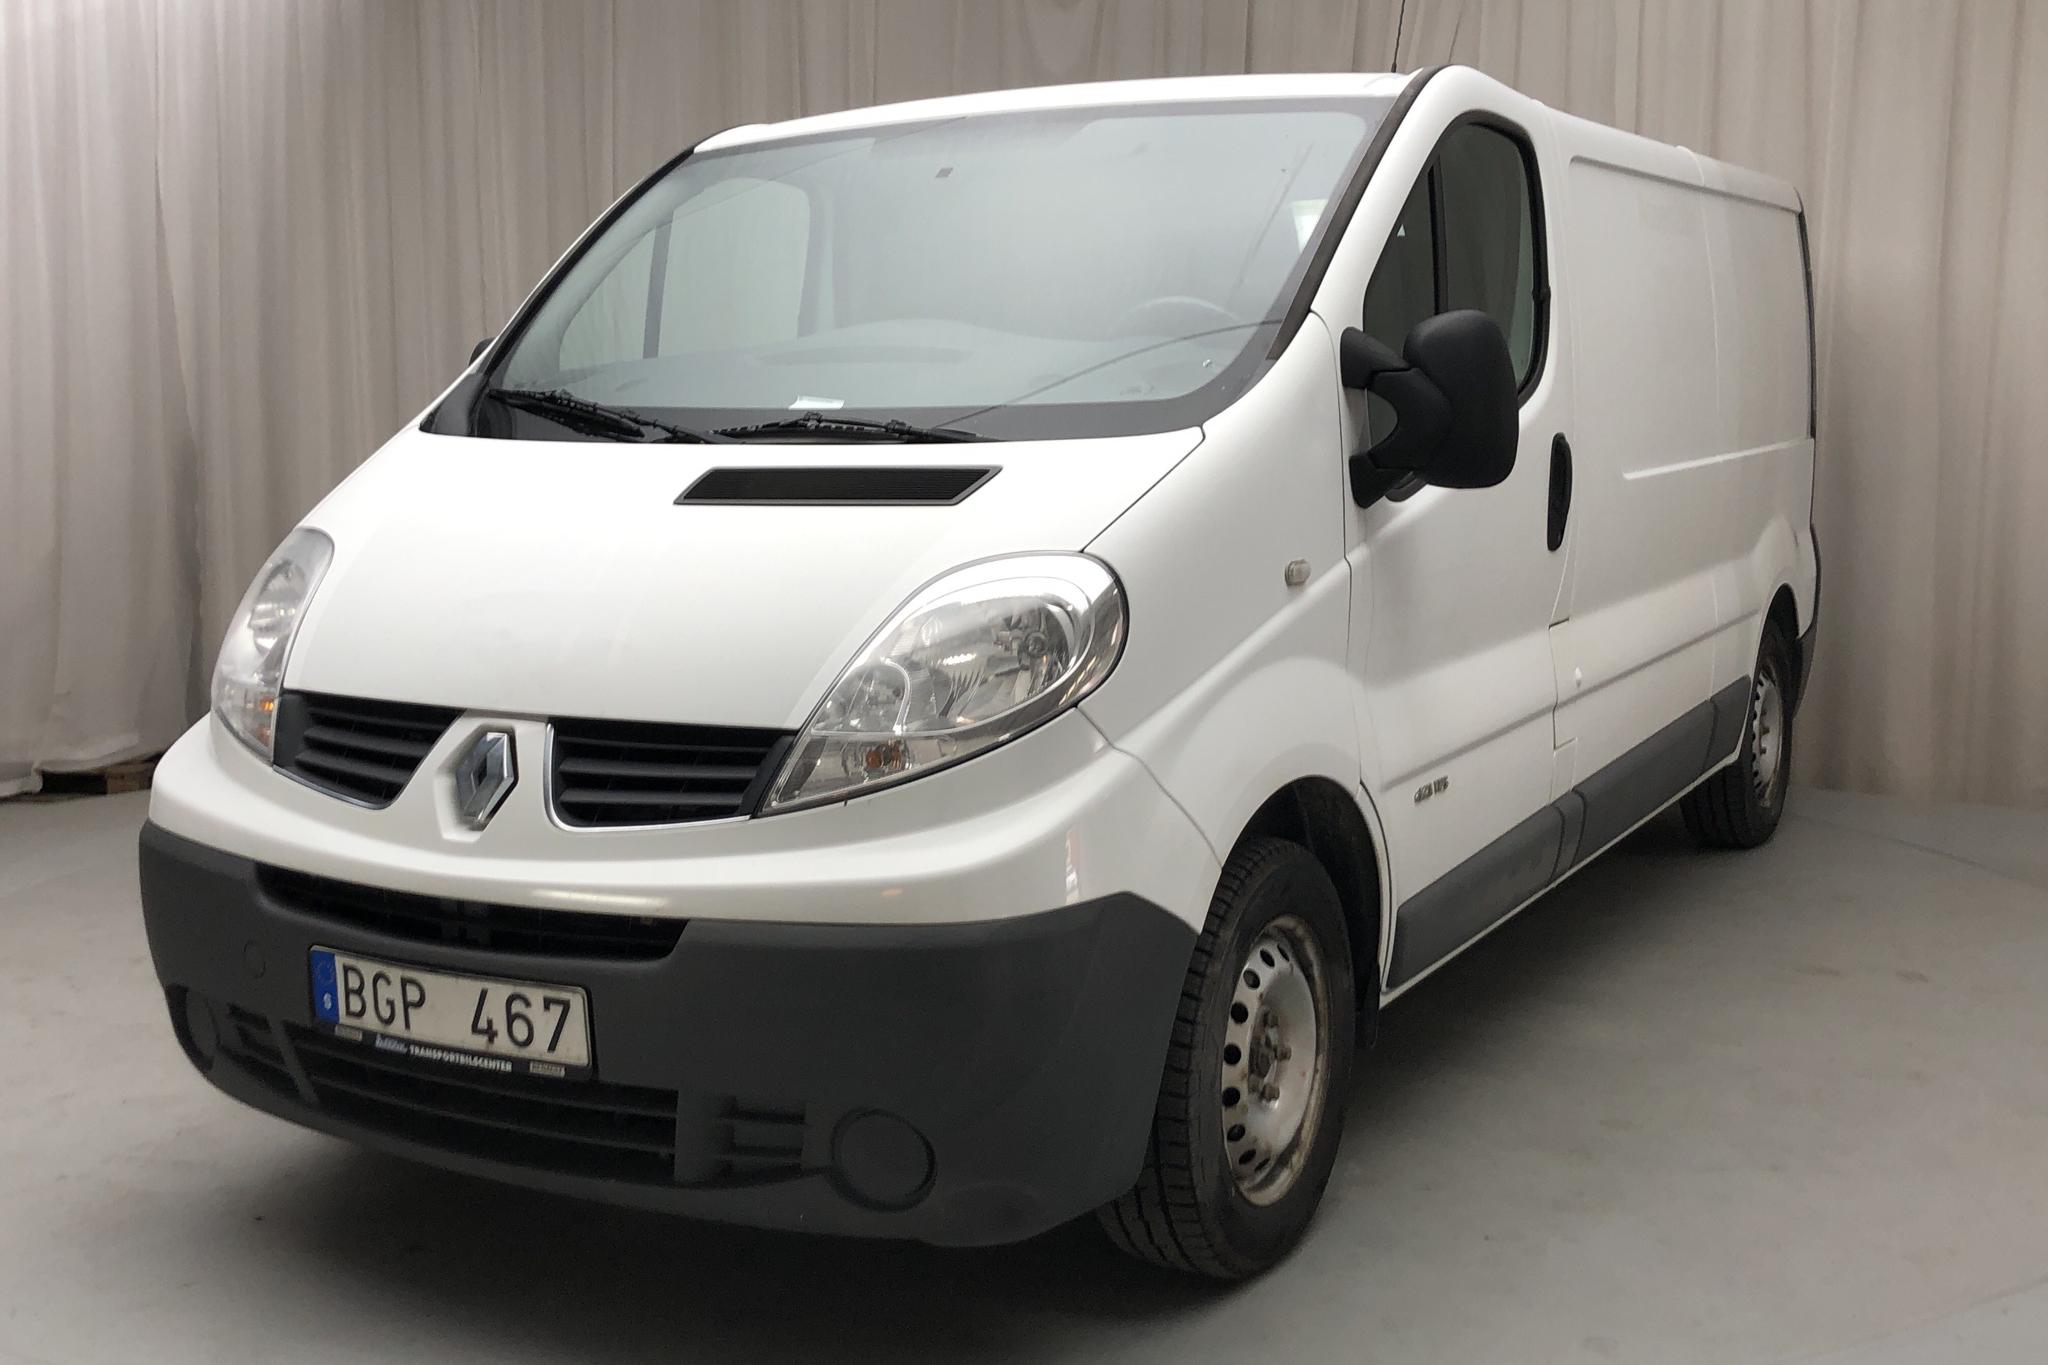 Renault Trafic 2.0 dCi Skåp/Buss (115hk) - 17 432 mil - Manuell - vit - 2013